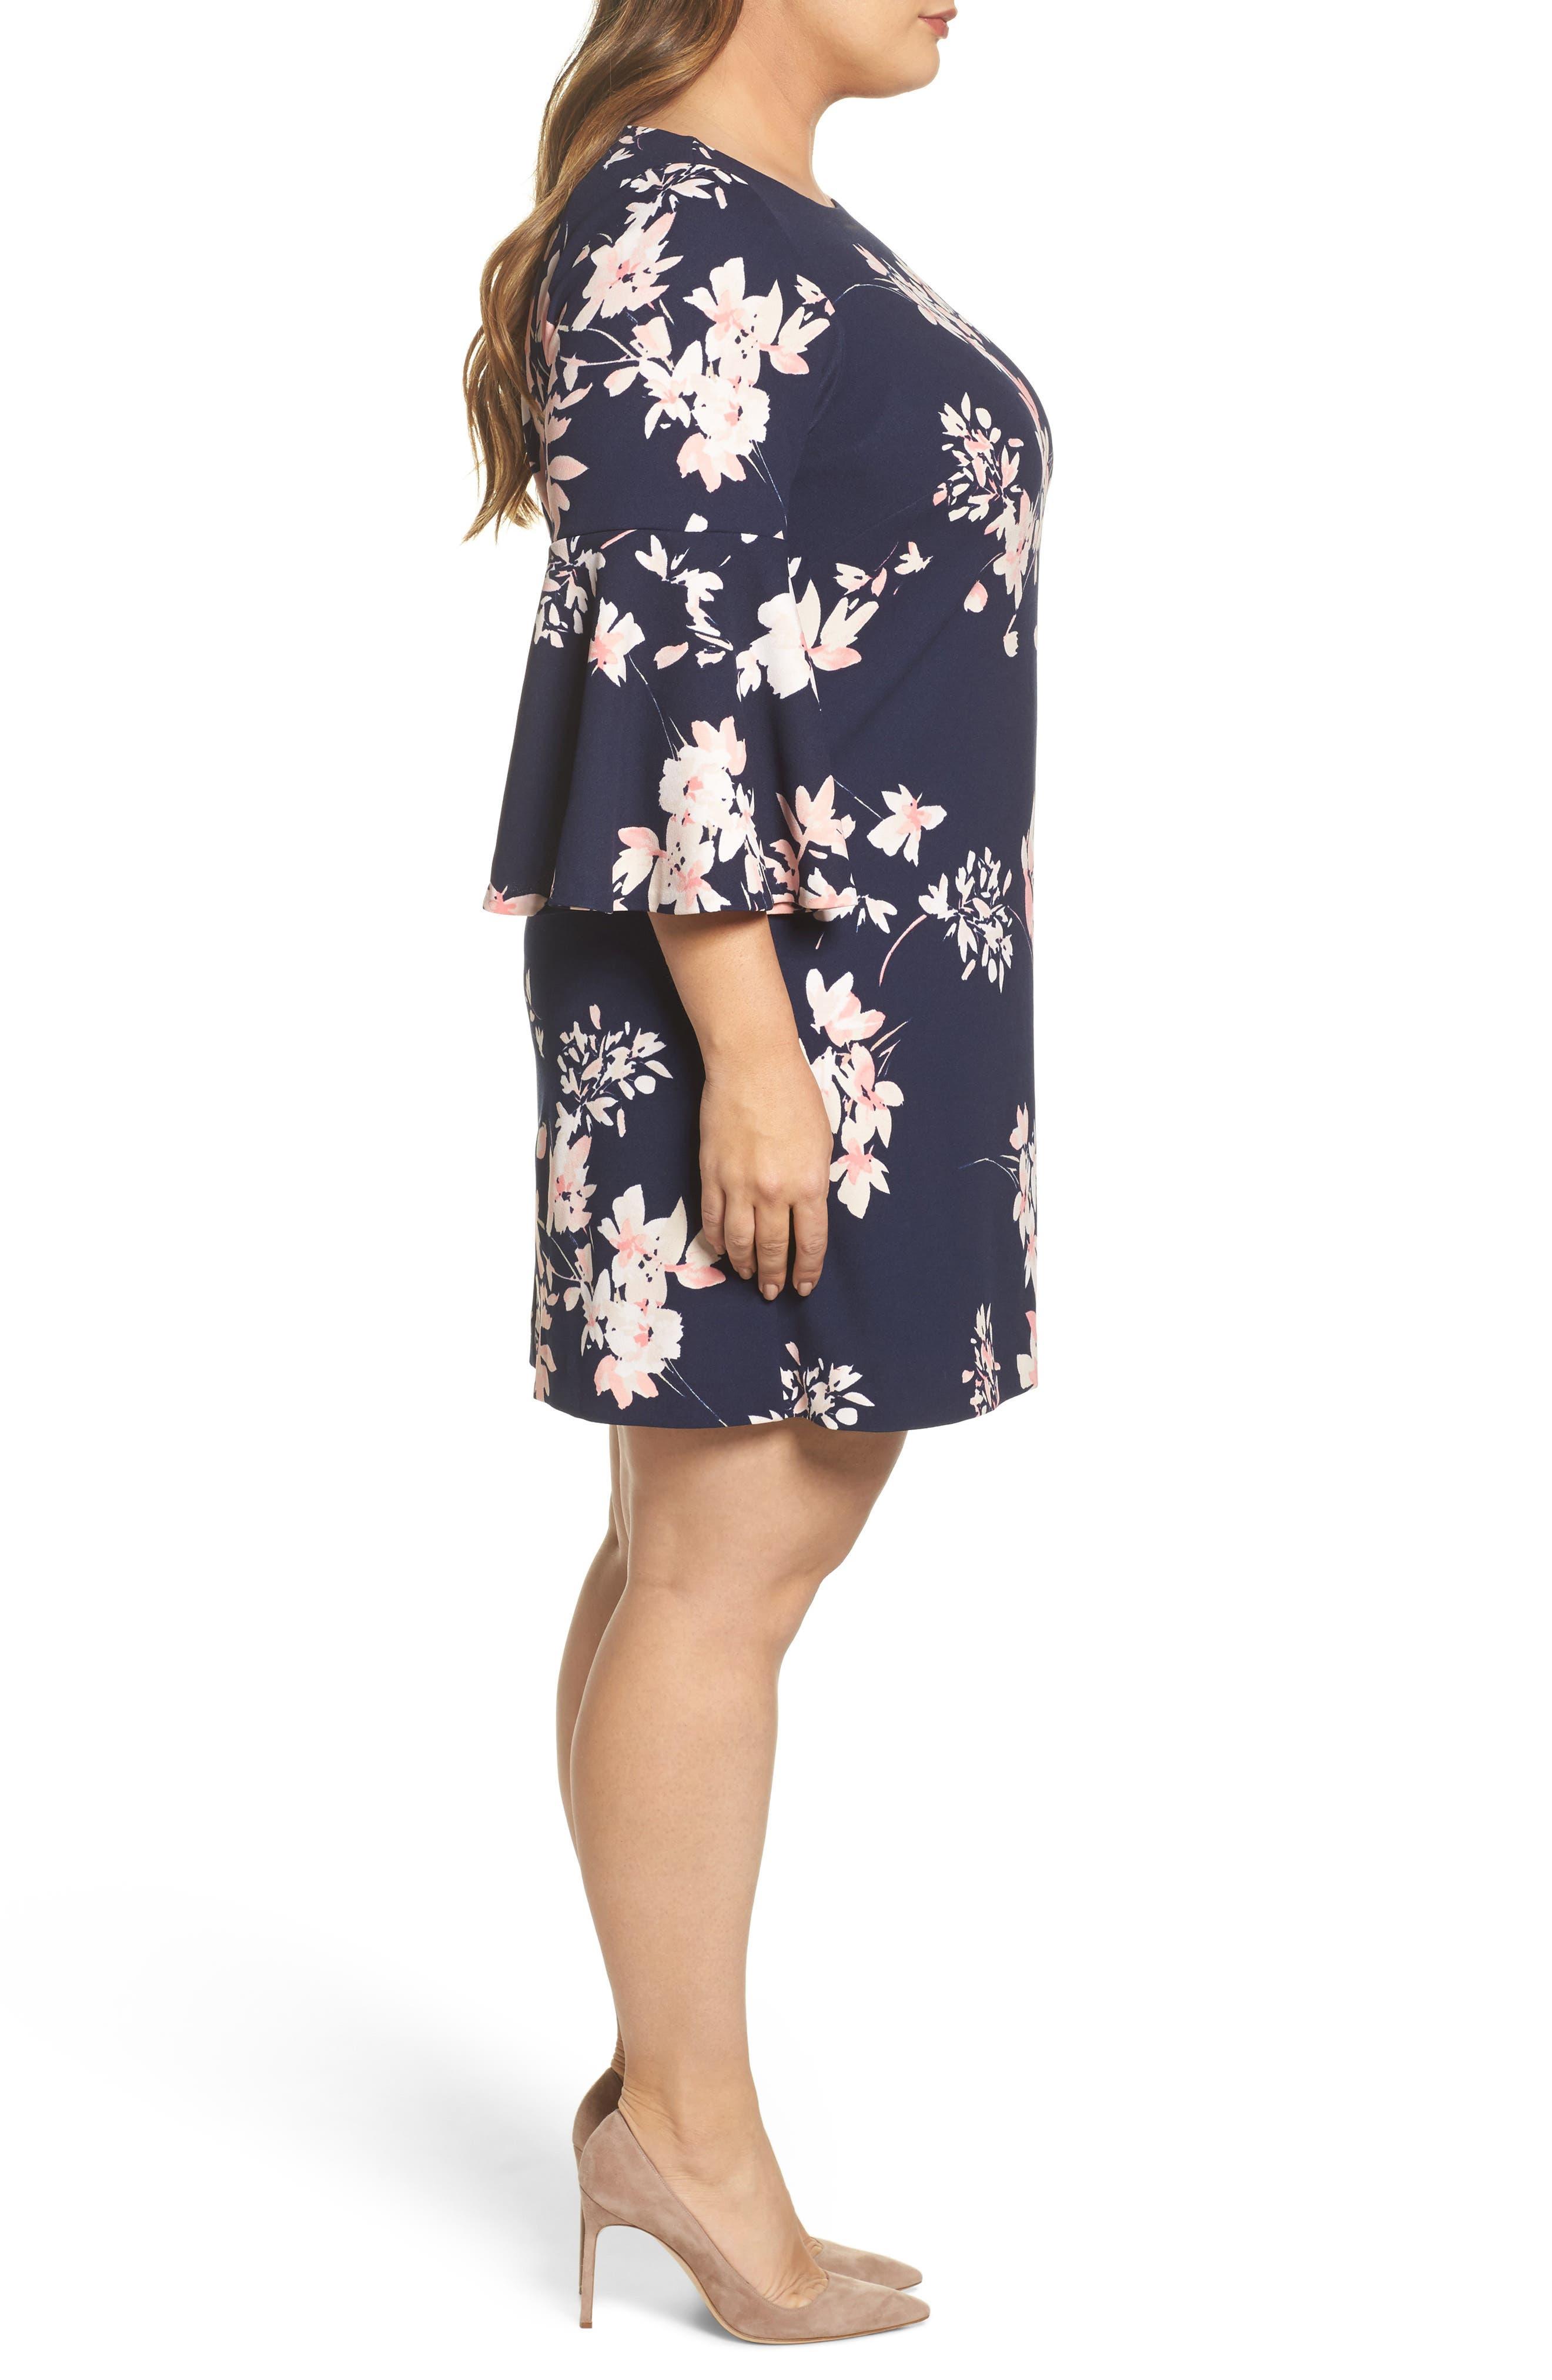 ELIZA J, Floral Print Bell Sleeve Shift Dress, Alternate thumbnail 3, color, NAVY/ PINK